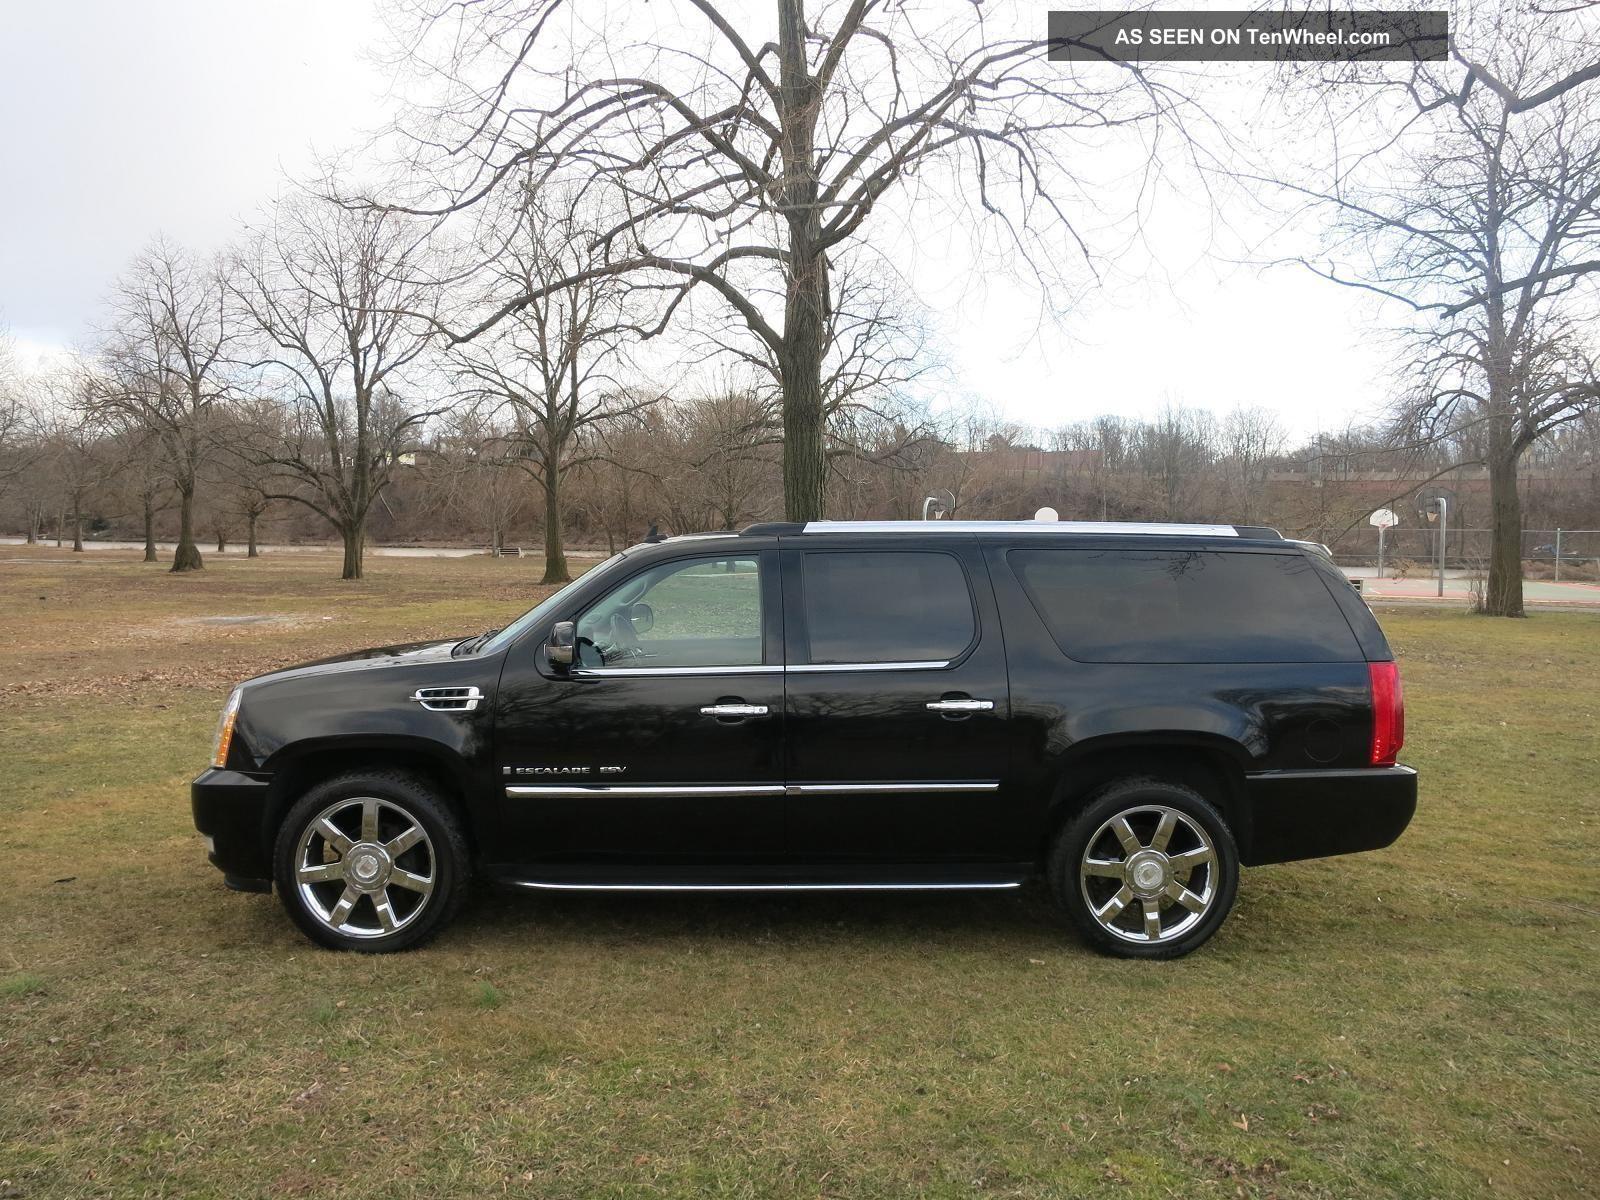 2008 Cadillac Escalade Options